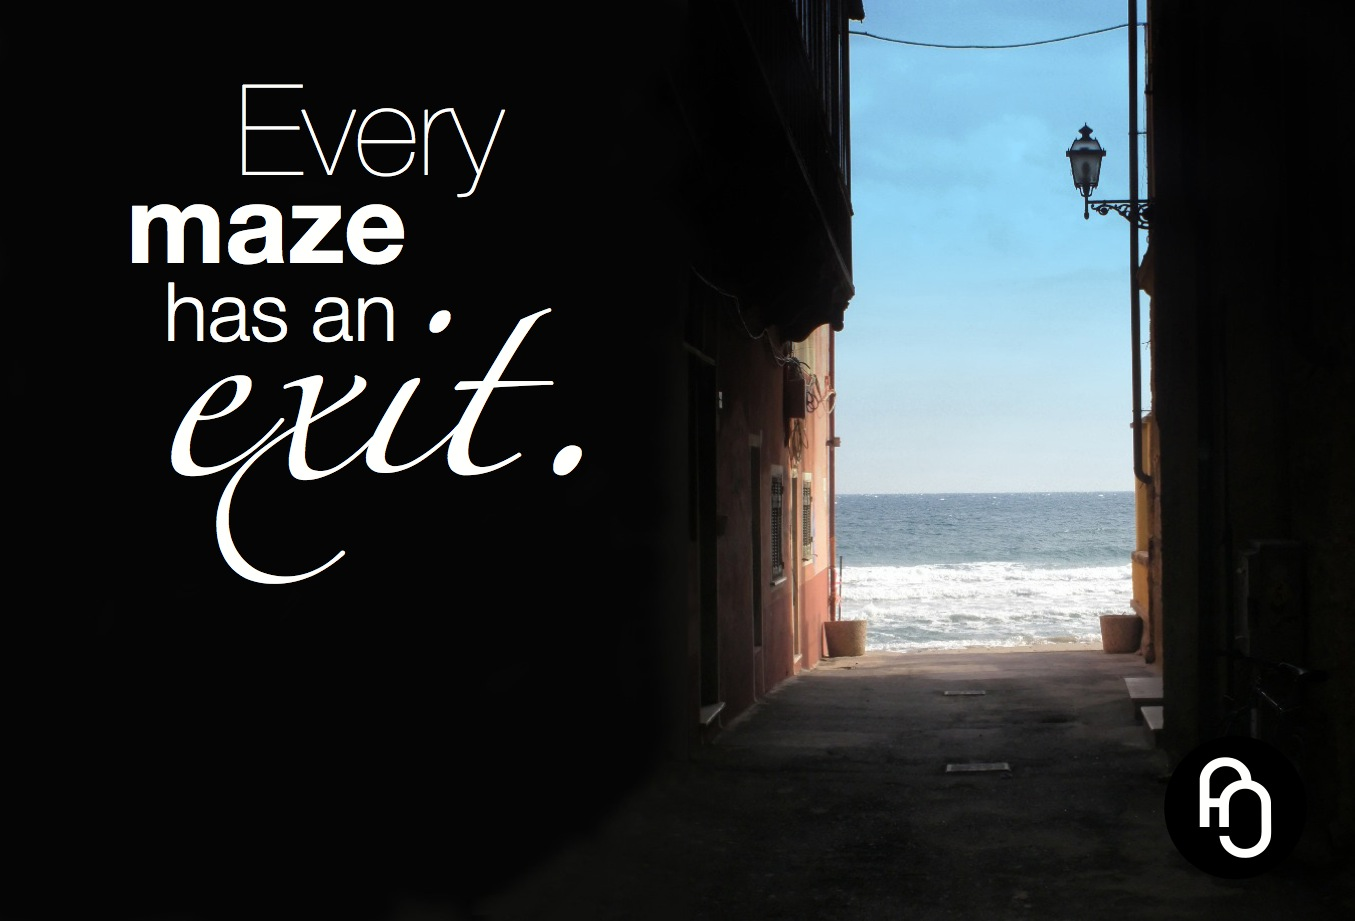 focusNjoy #59: Every maze has an exit